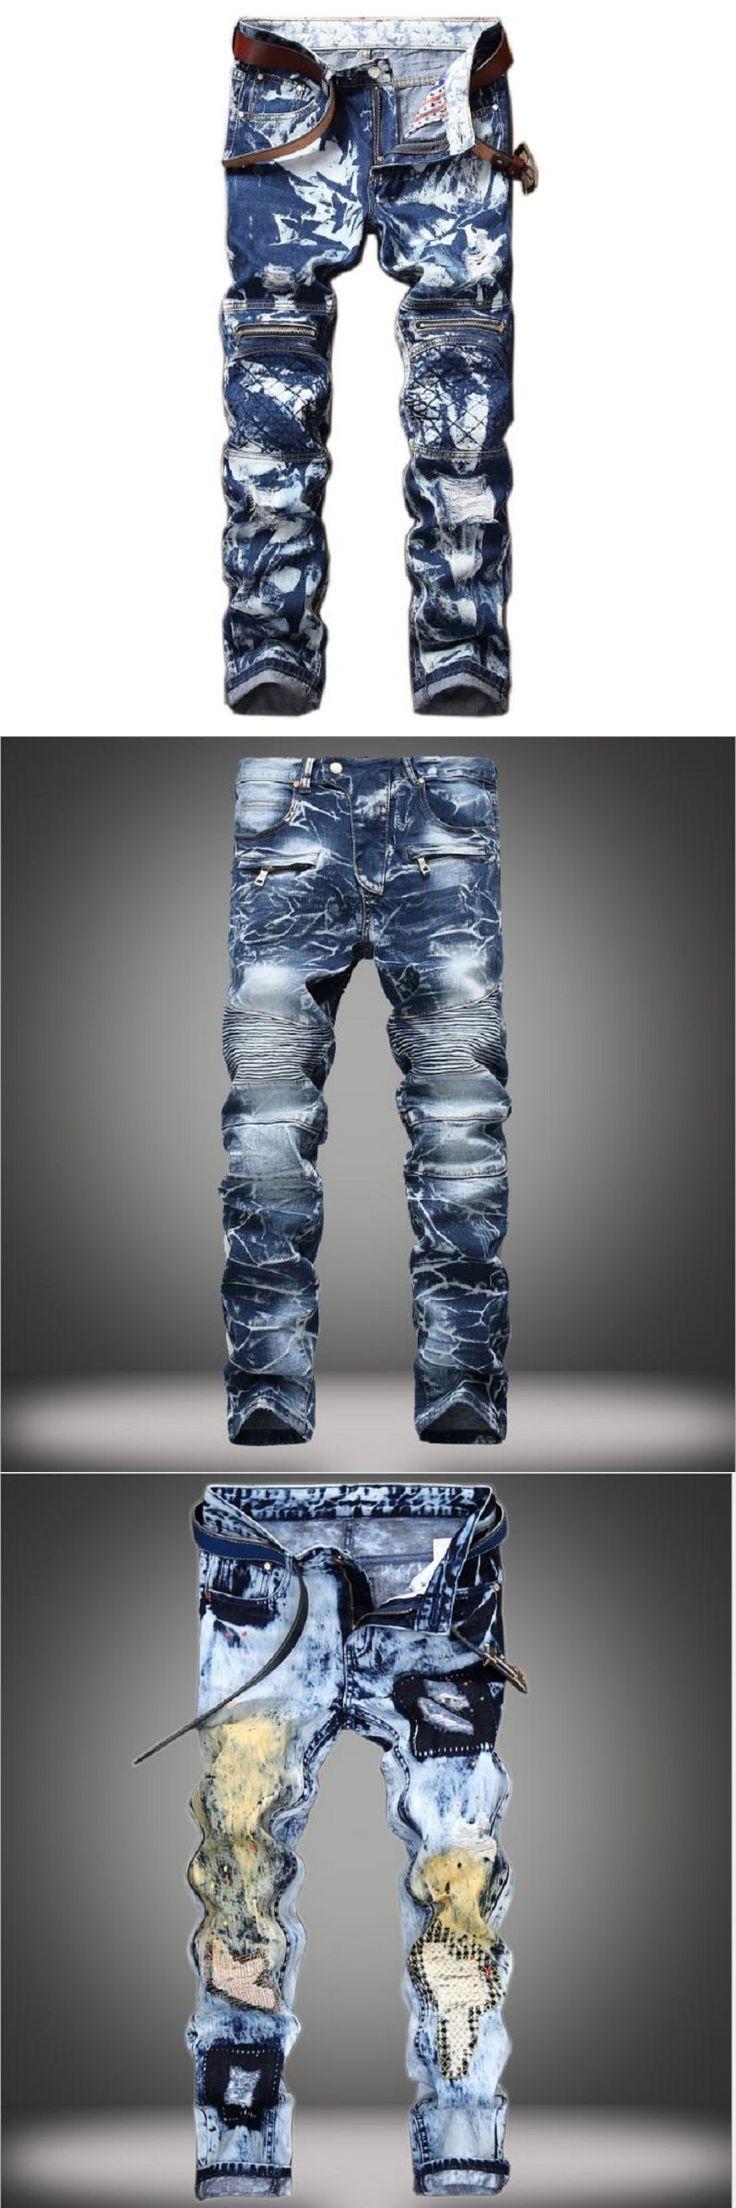 men's jeans are worn by stylish pleated snow Men's Fashion spelt Slim denim overall zipper jean homme Biker jeans